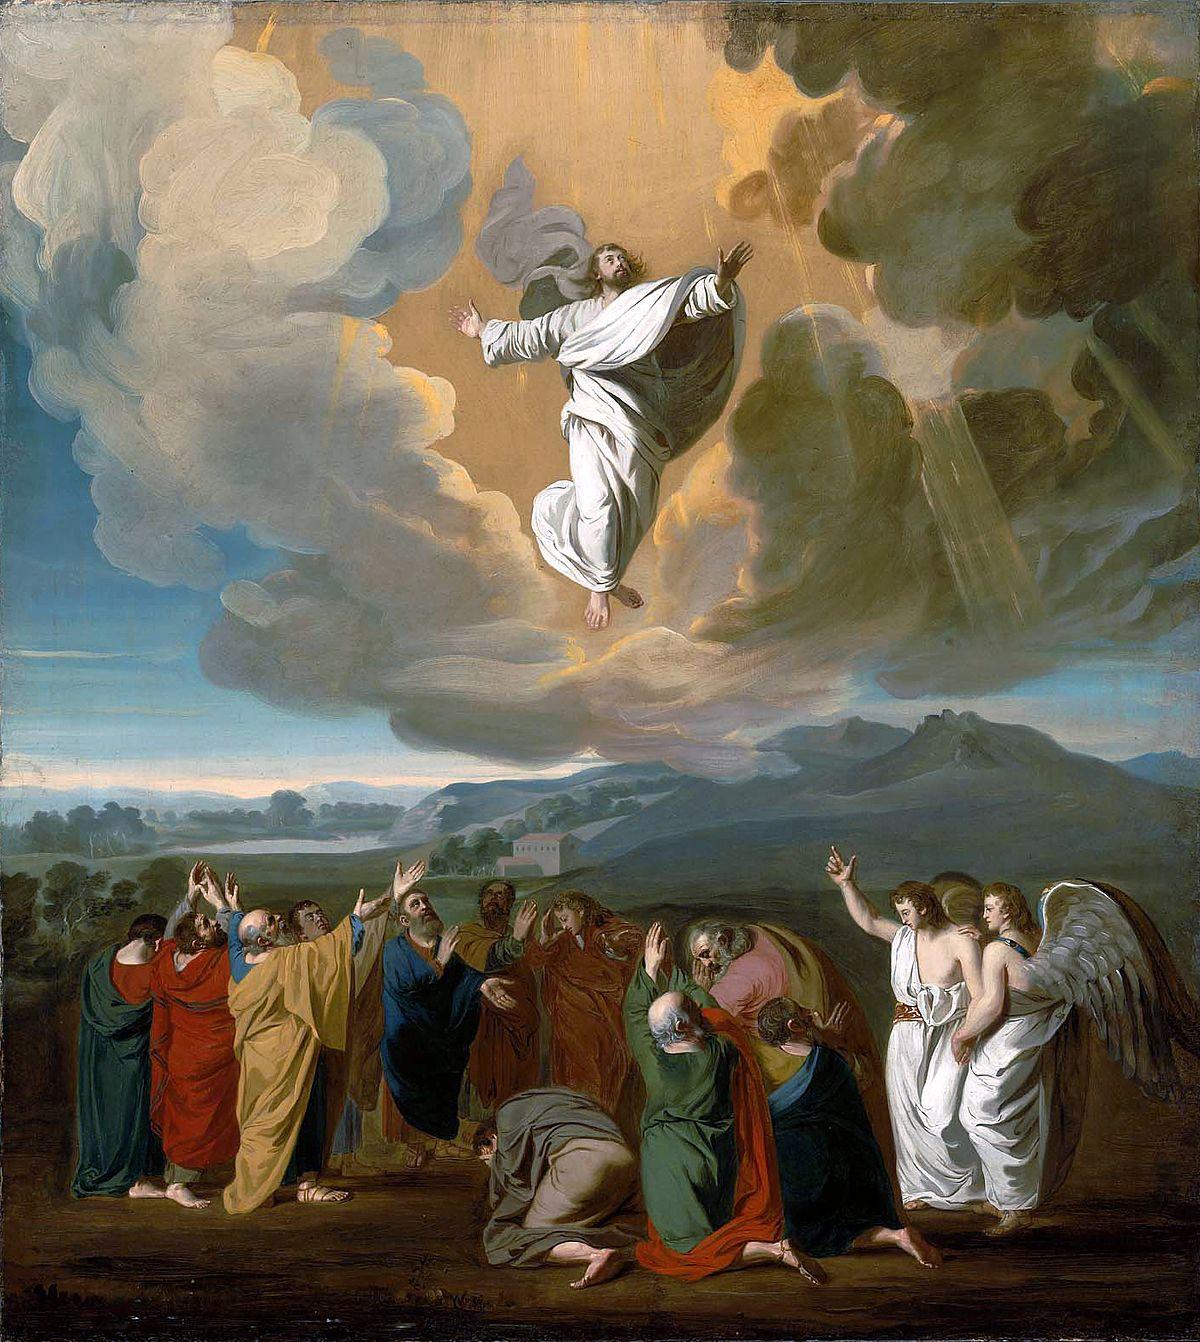 Jesus_ascending_to_heaven.jpg